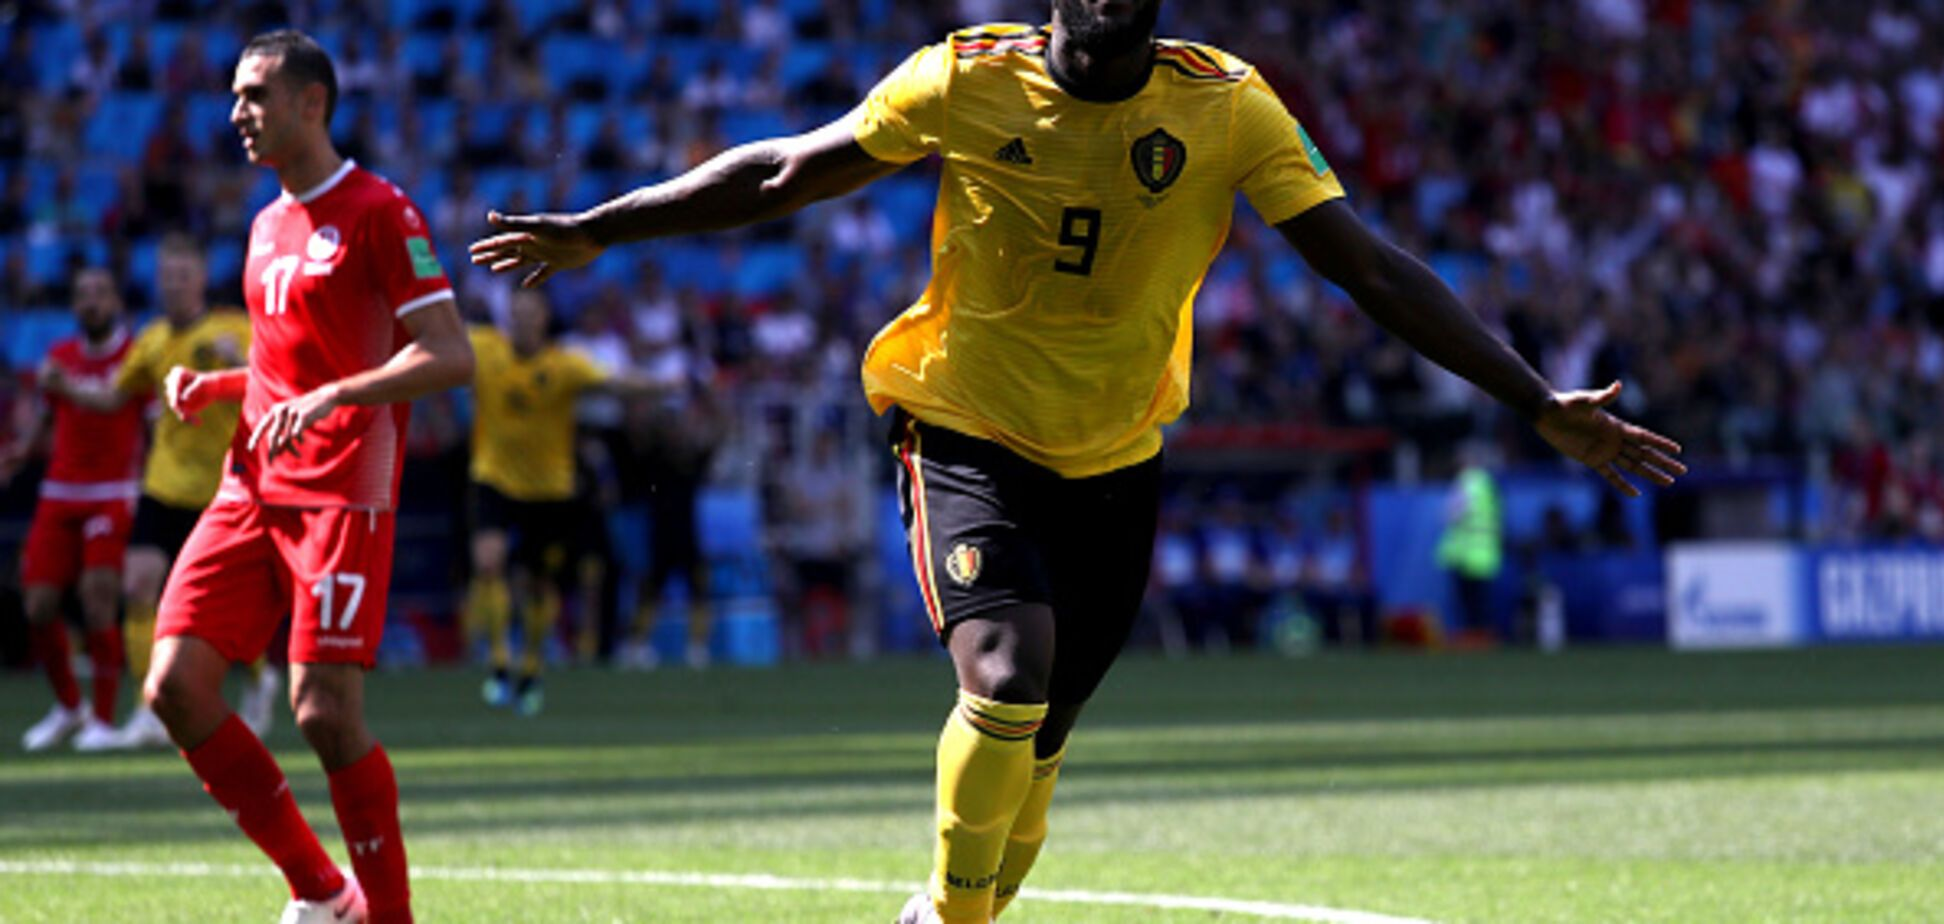 Матч Бельгия - Тунис установил рекорд ЧМ-2018